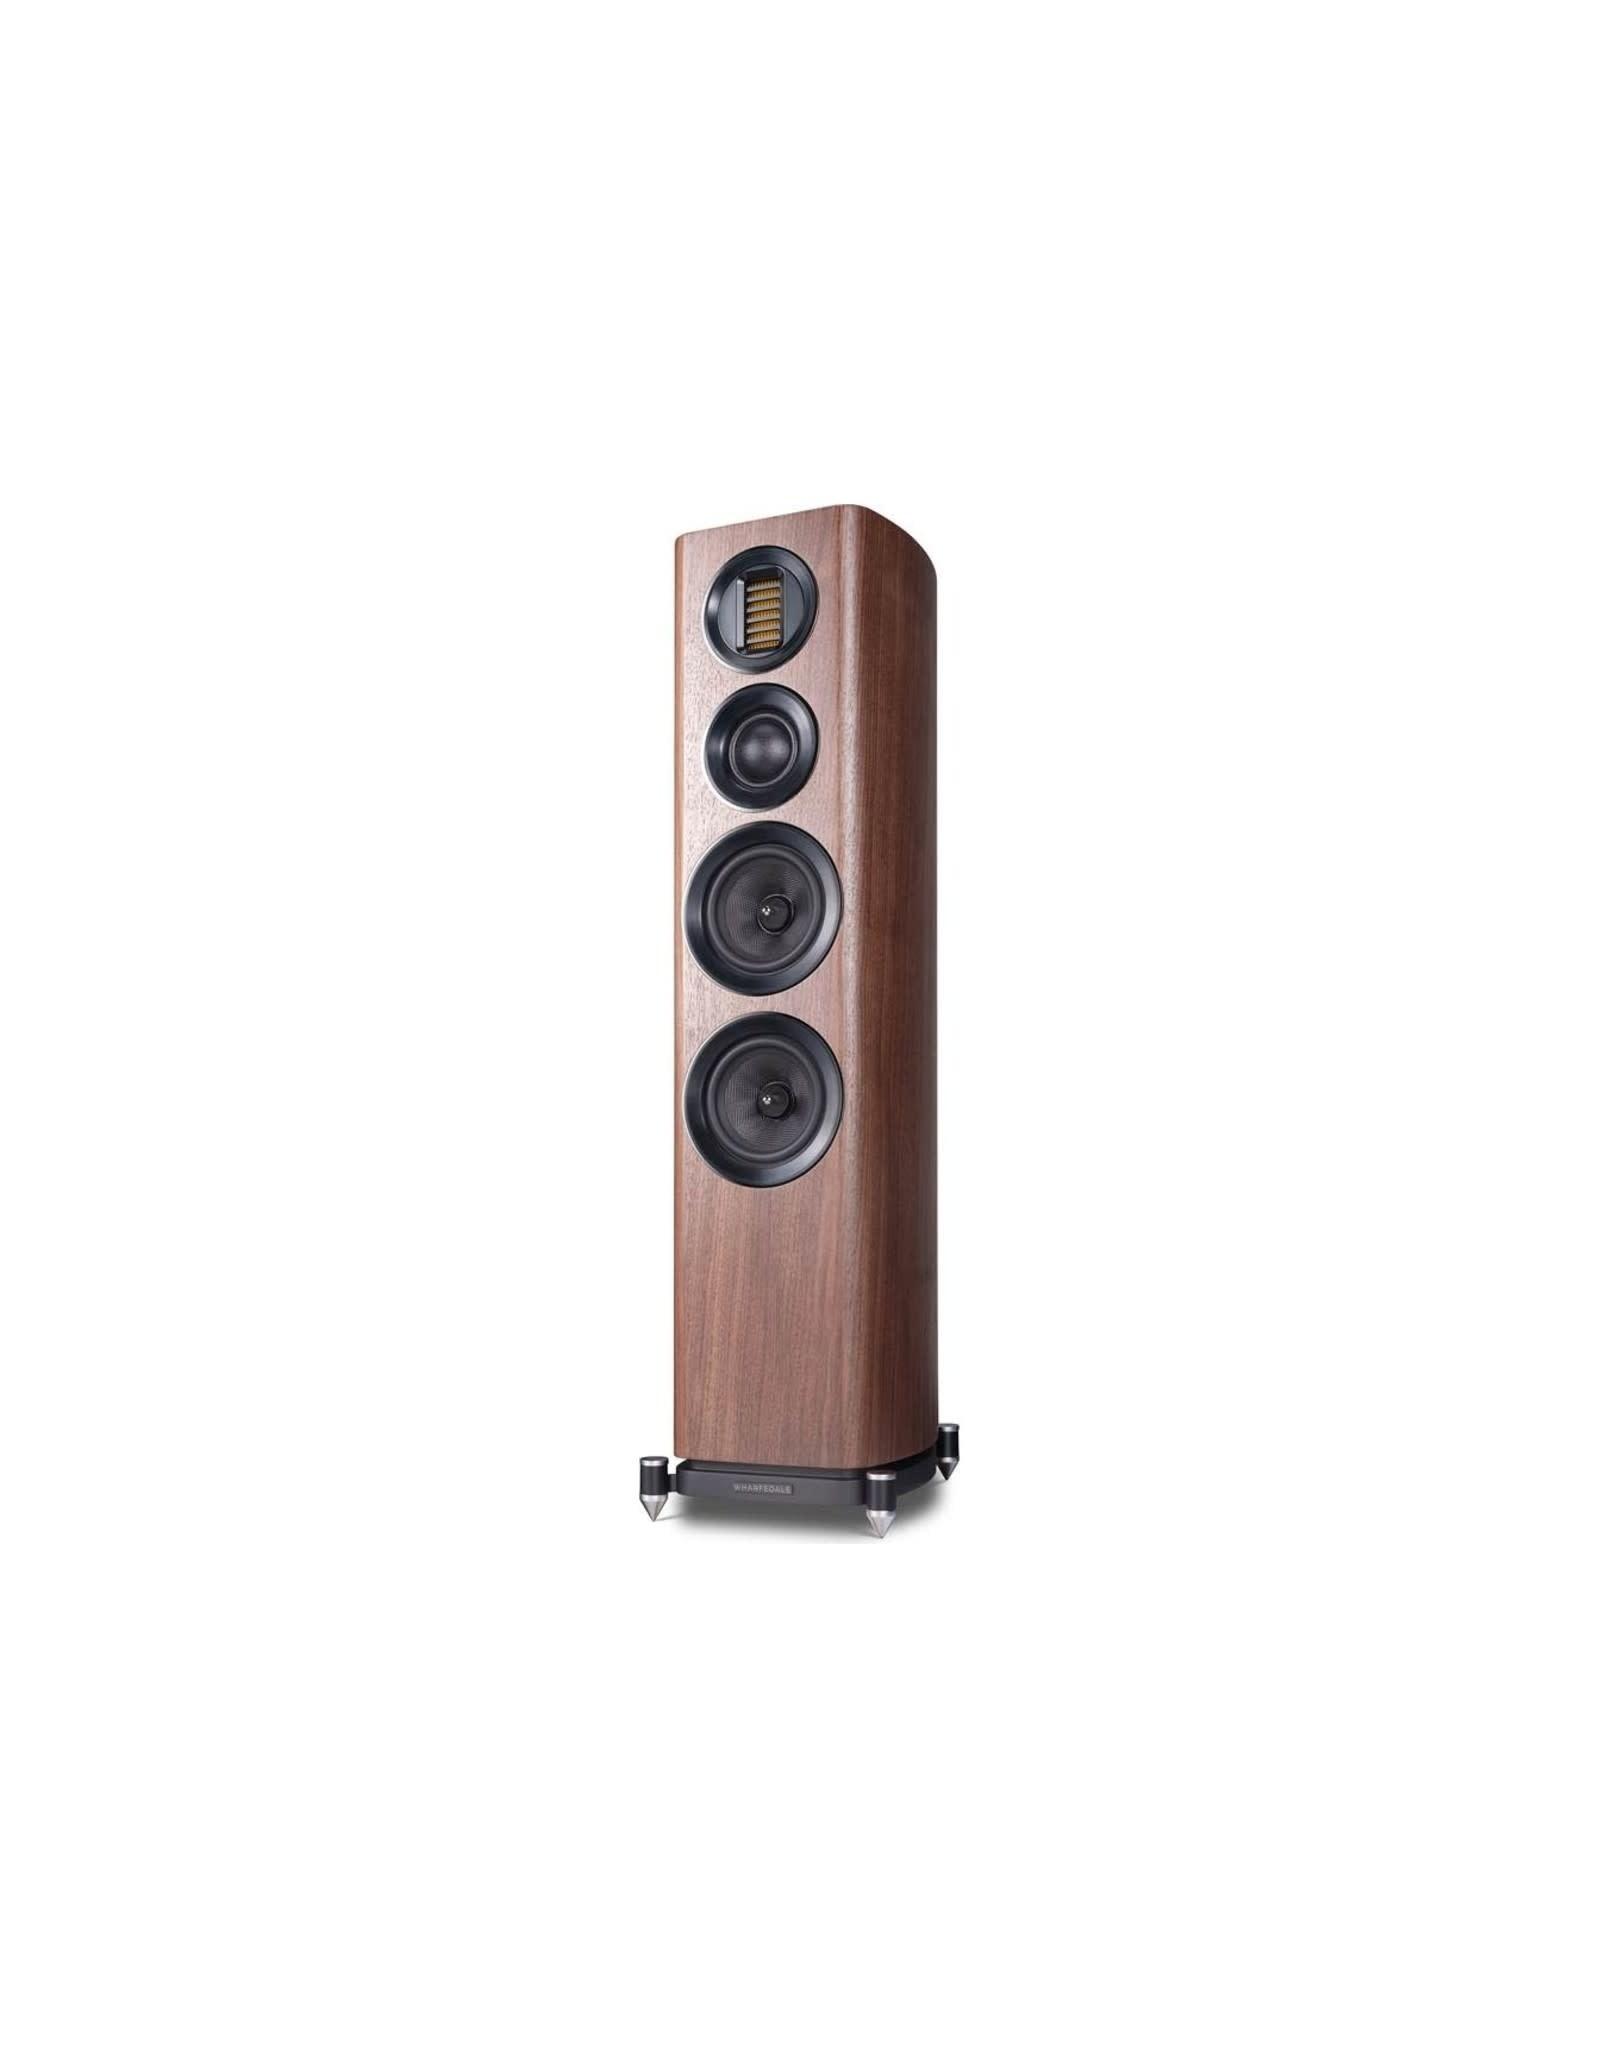 Wharfedale Wharfedale EVO4.3 Floorstanding Speakers Walnut OPEN STOCK (NOT USED)